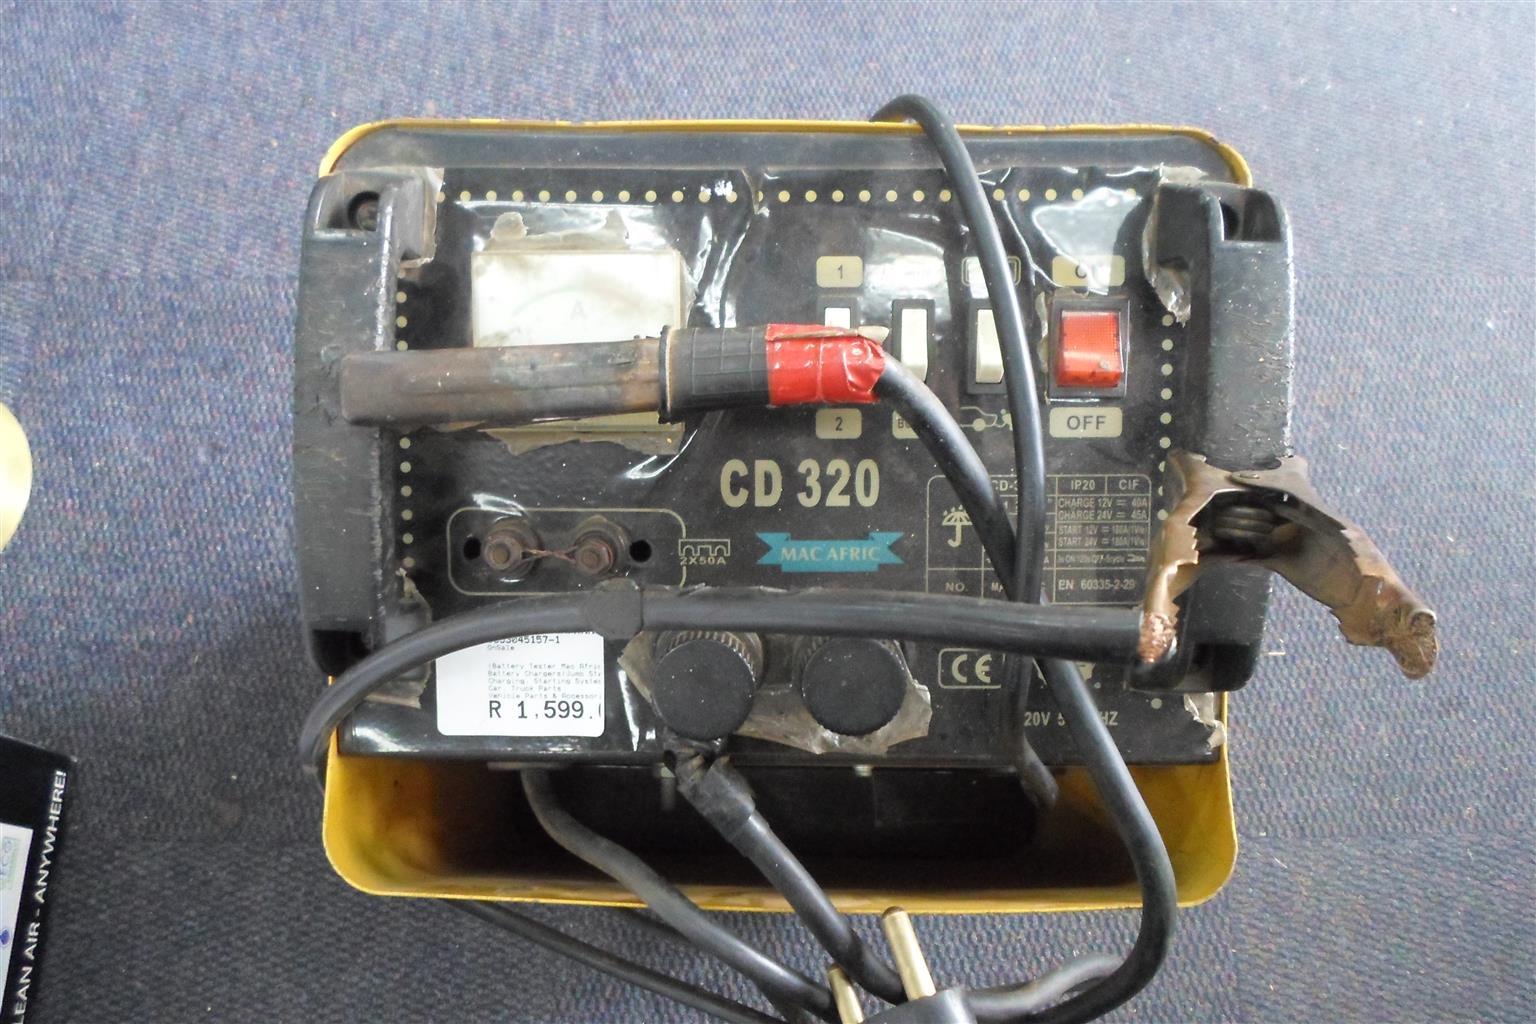 Mac Afric CD320 Battery Tester